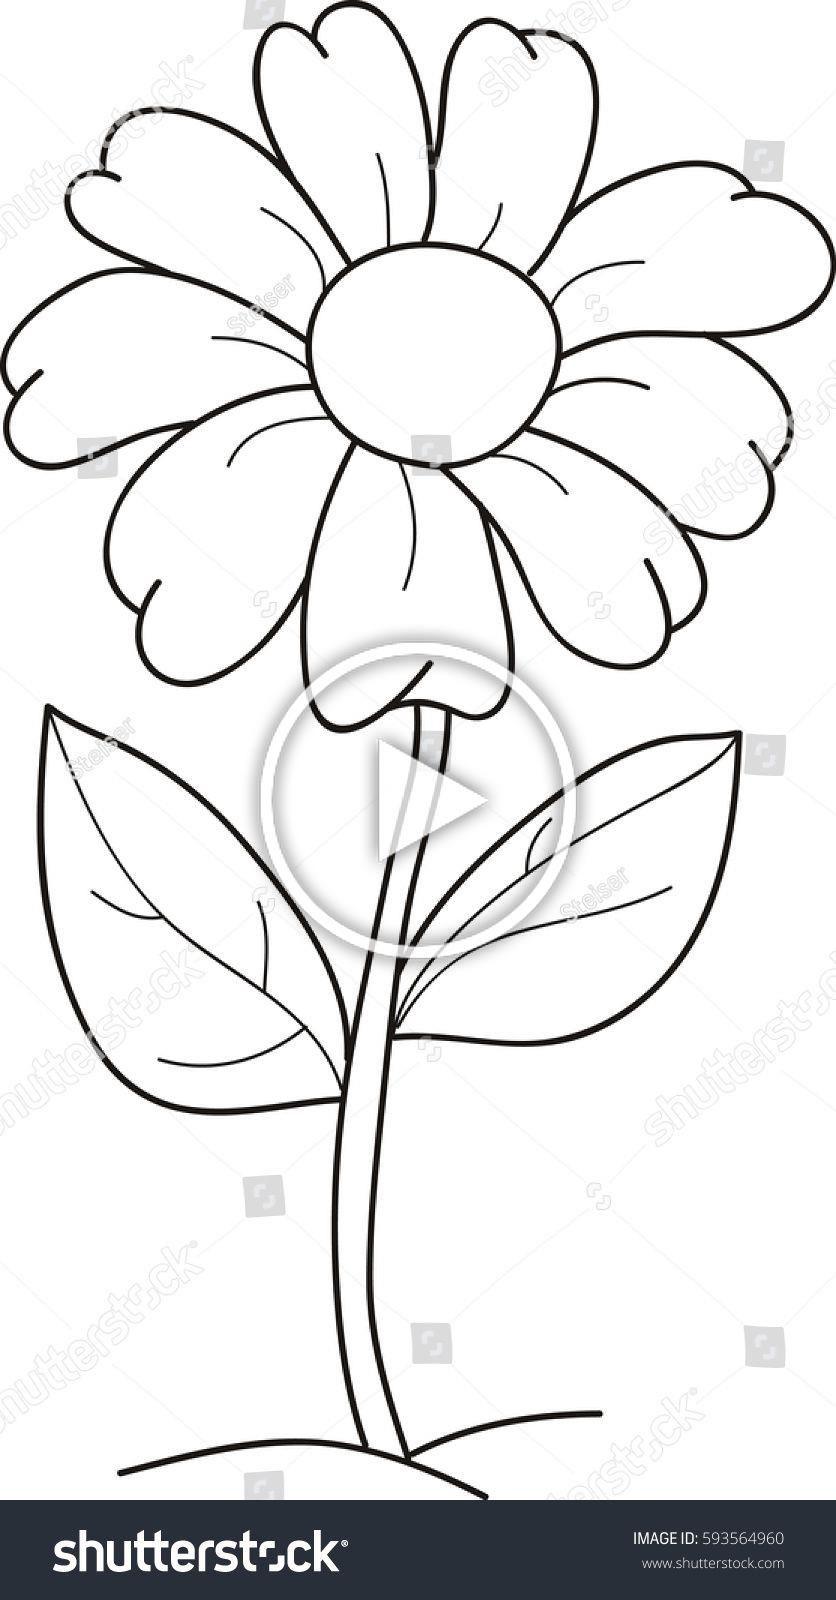 Vetor Stock De Ilustracao Vetorial De Desenhos Animados De Livre De Direitos 59356 In 2020 Easy Flower Drawings Printable Flower Coloring Pages Flower Coloring Pages